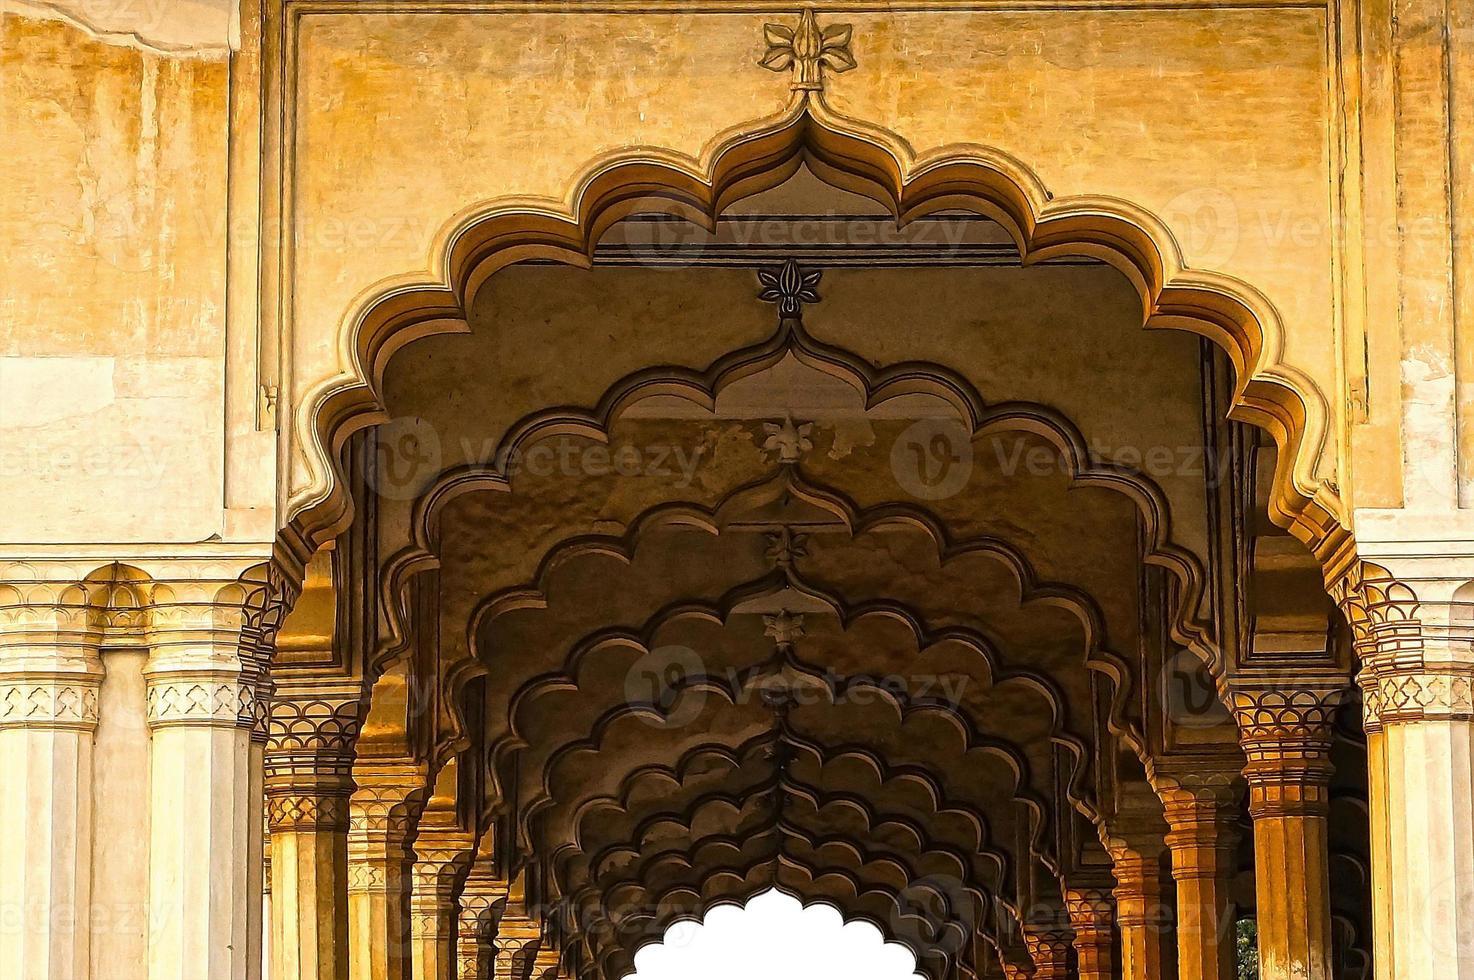 Säulenhalle in roter Festung. Agra, Indien foto